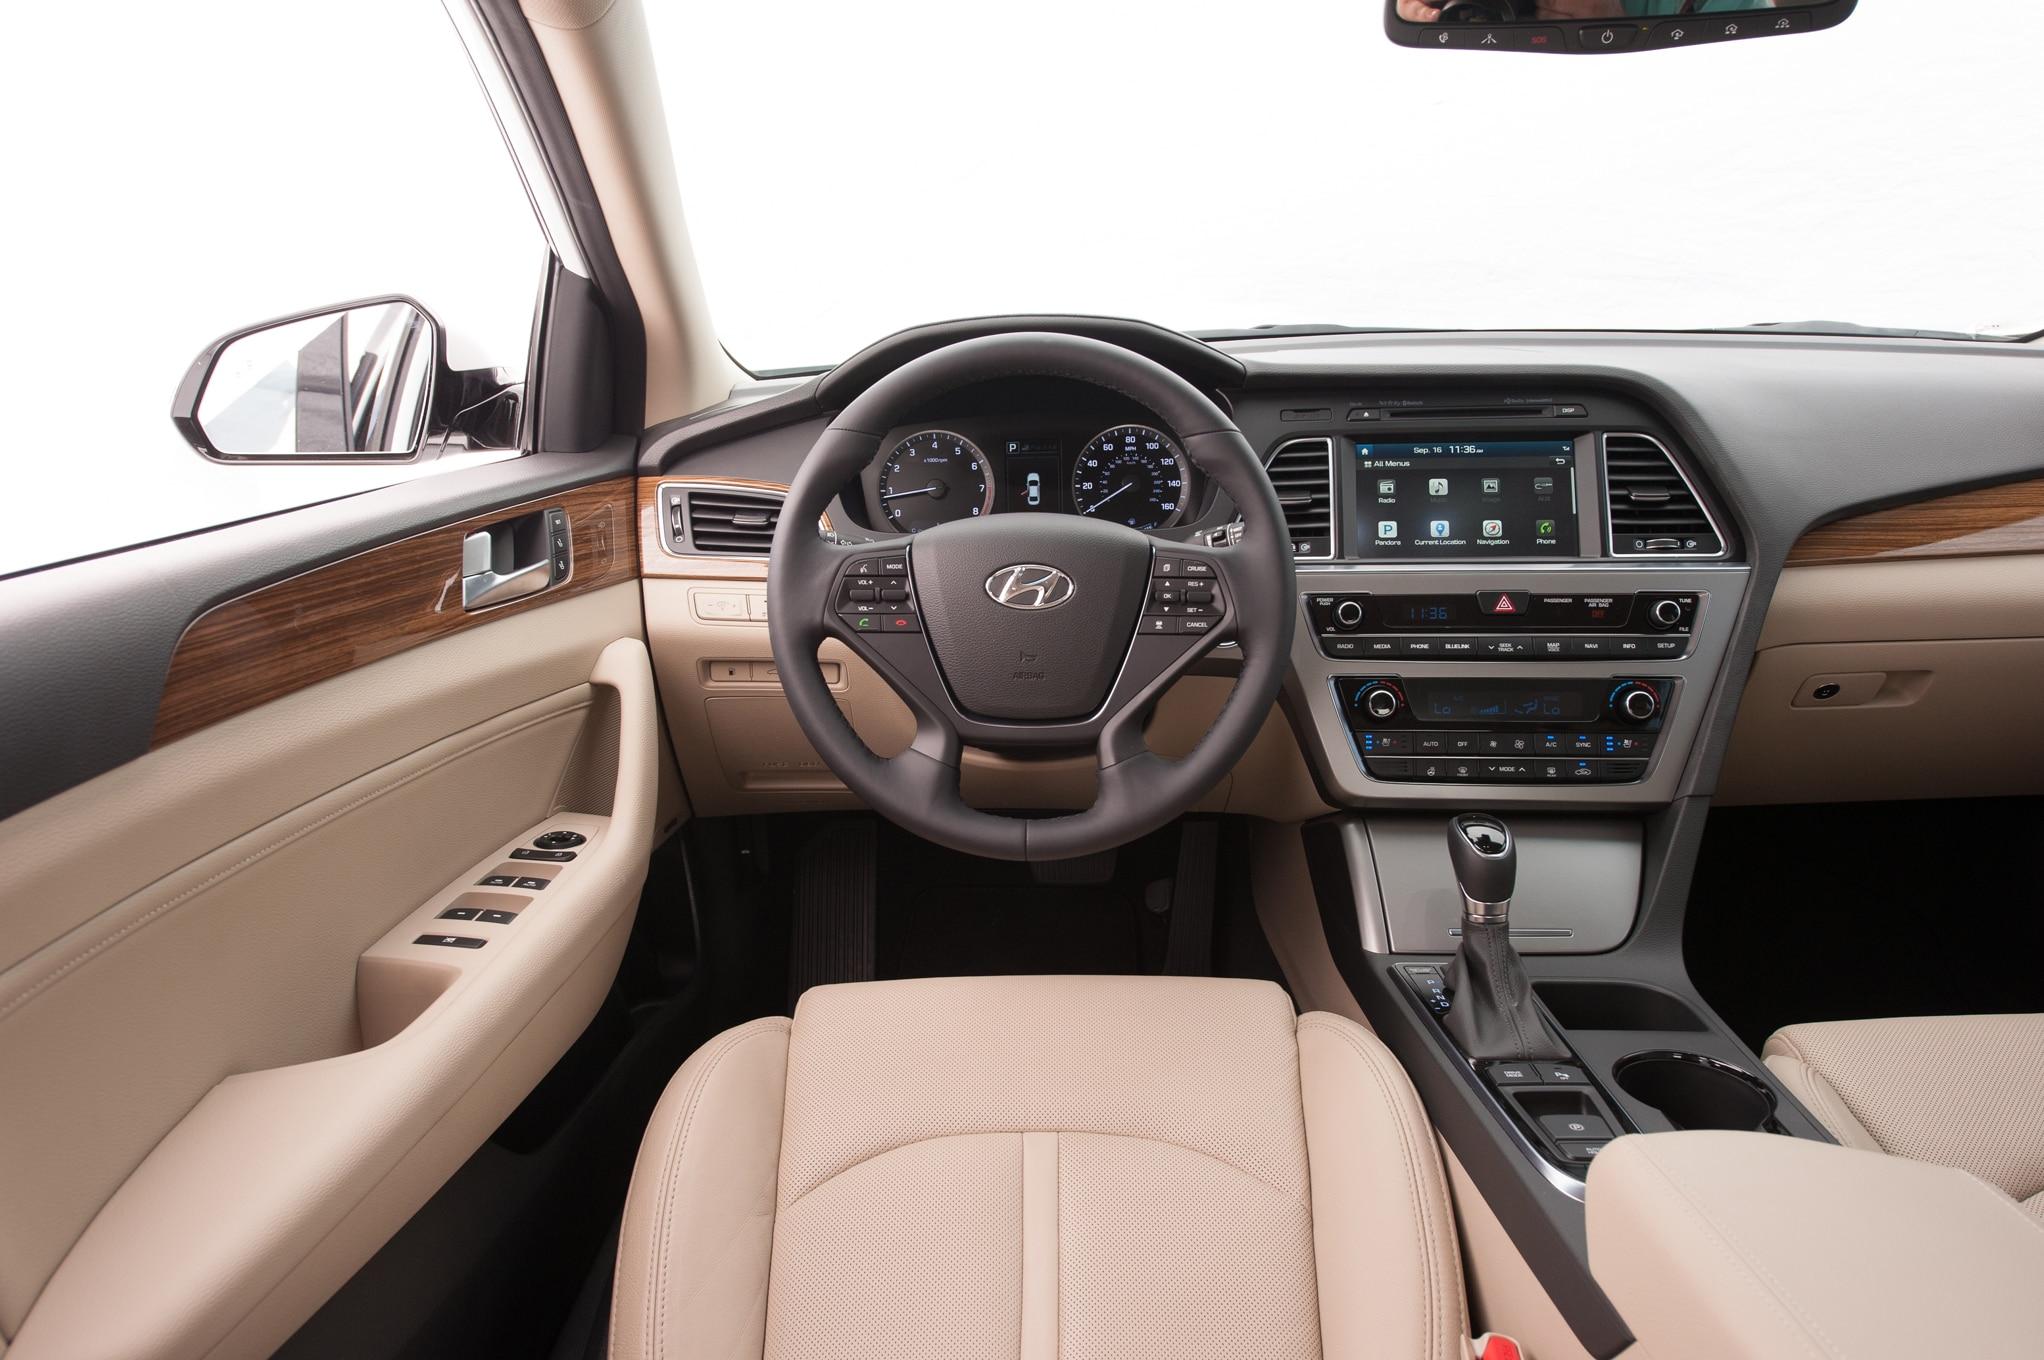 Hyundai sonata limited 2 4 2015 primera prueba - 2015 hyundai sonata interior pictures ...